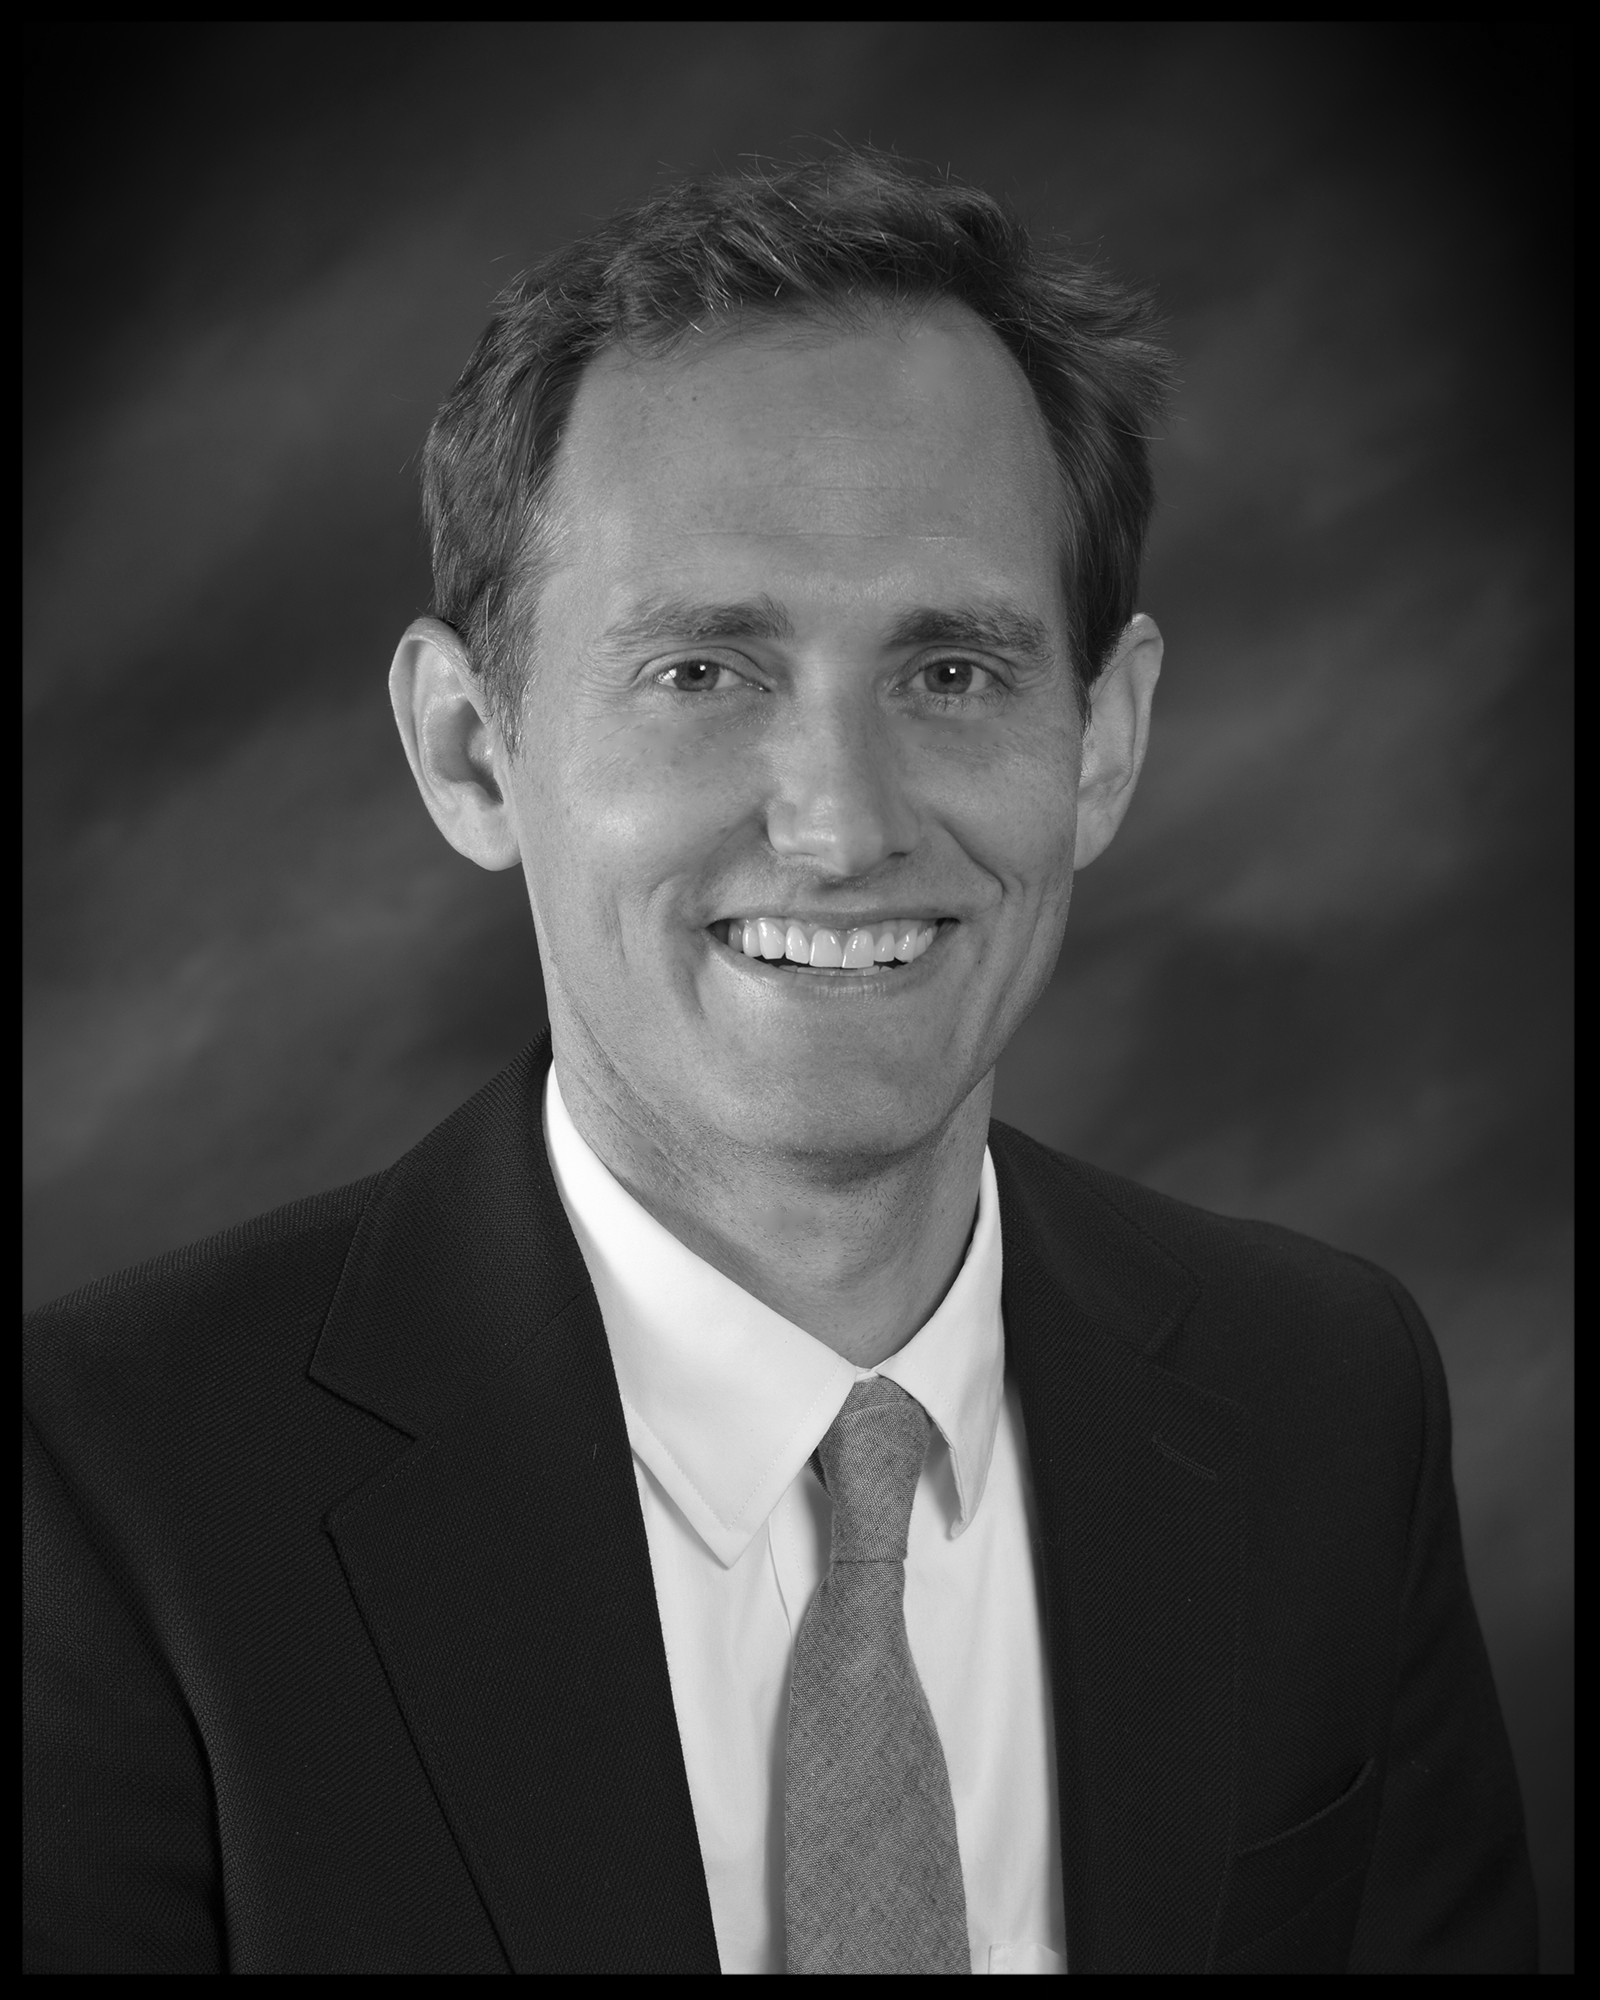 Attorney Michael Hales